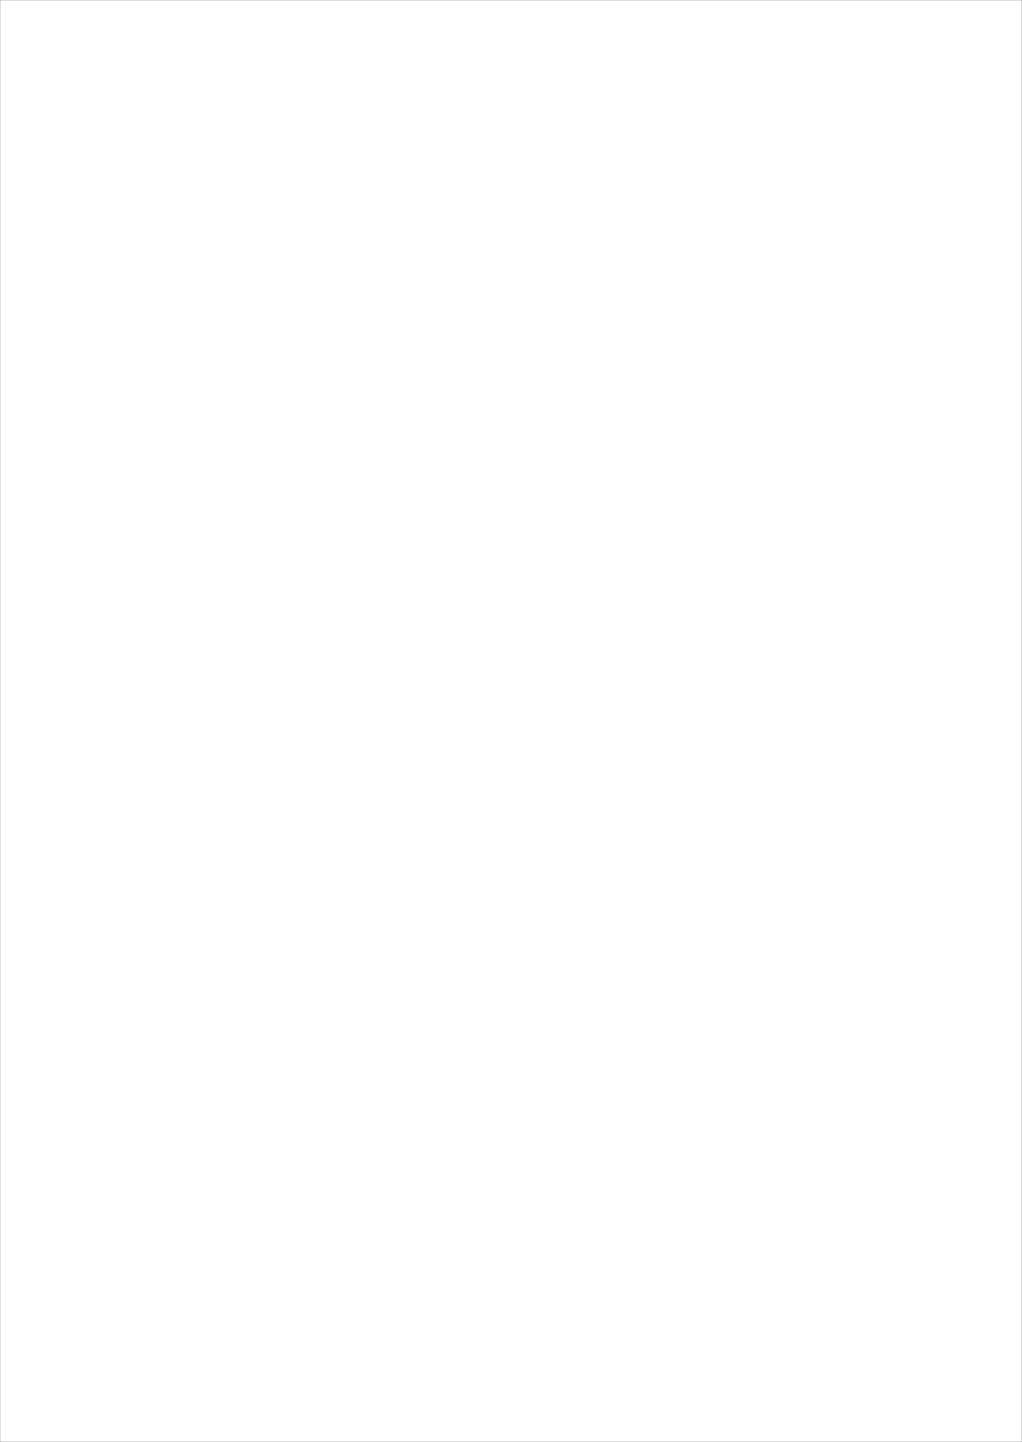 Kiyohime Lovers Vol. 01 - Kiyohime to Hajimete 22